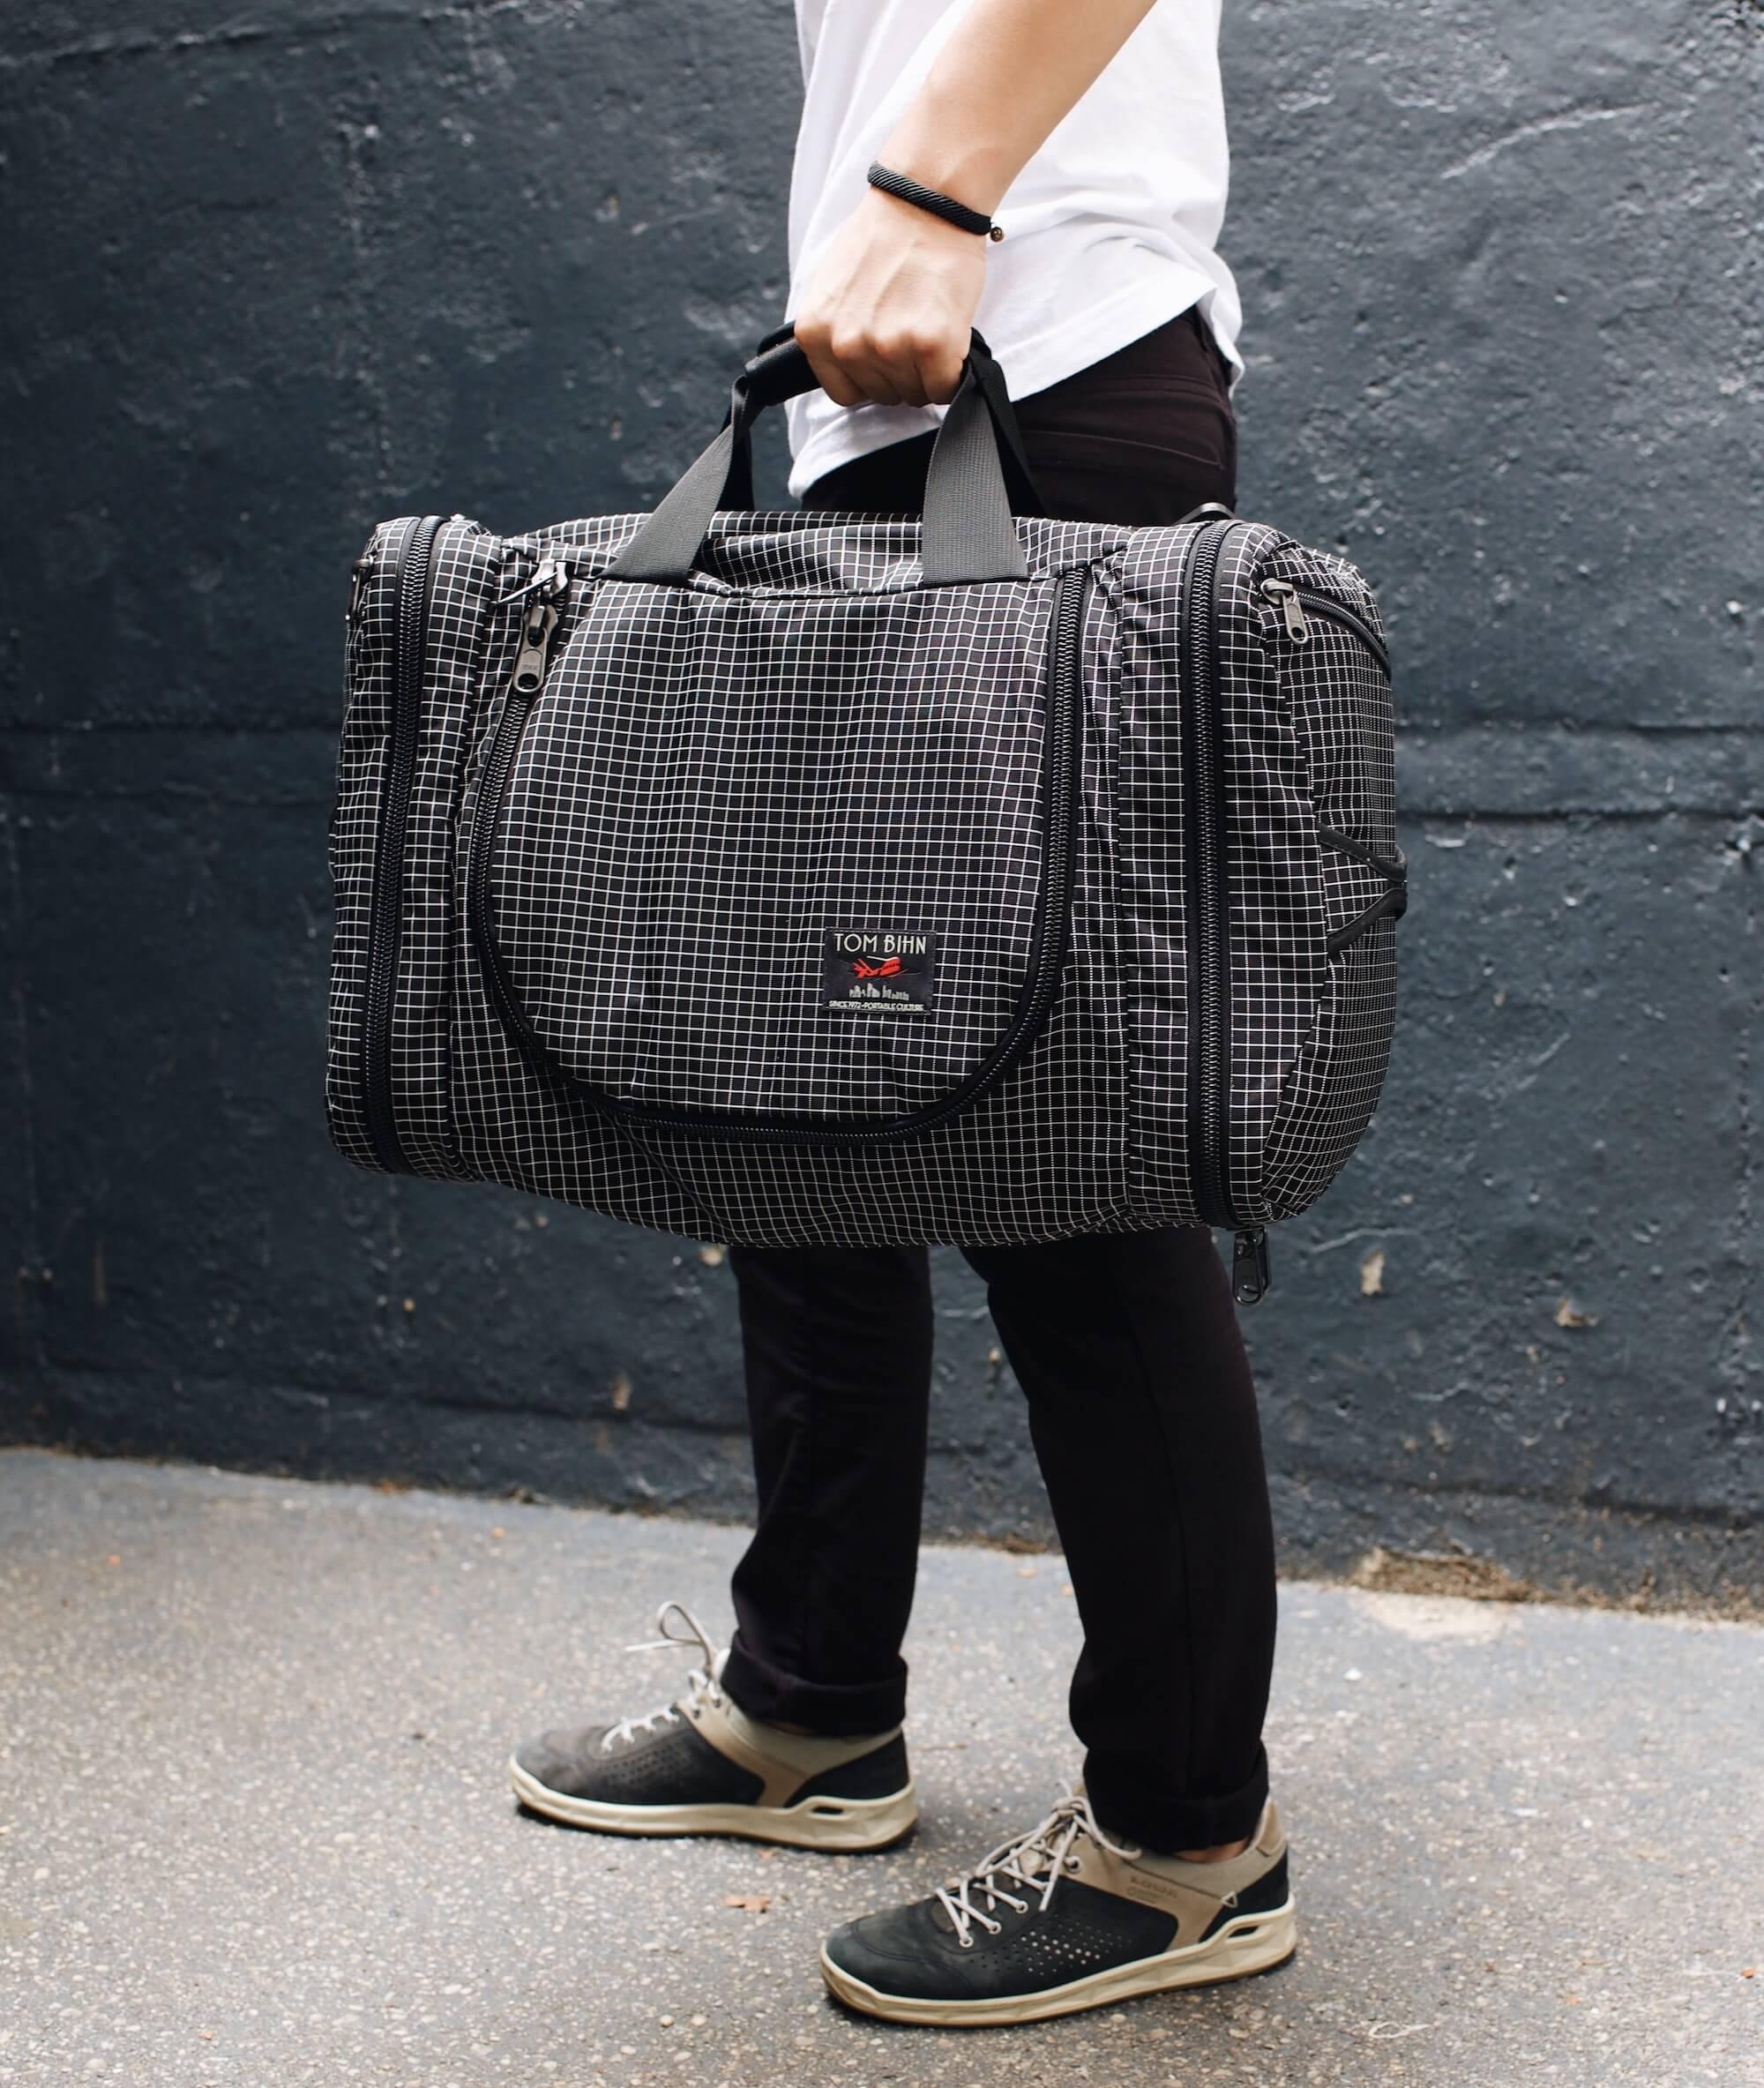 Aeronaut Backpack: Tom Bihn Aeronaut 30 Backpack Review